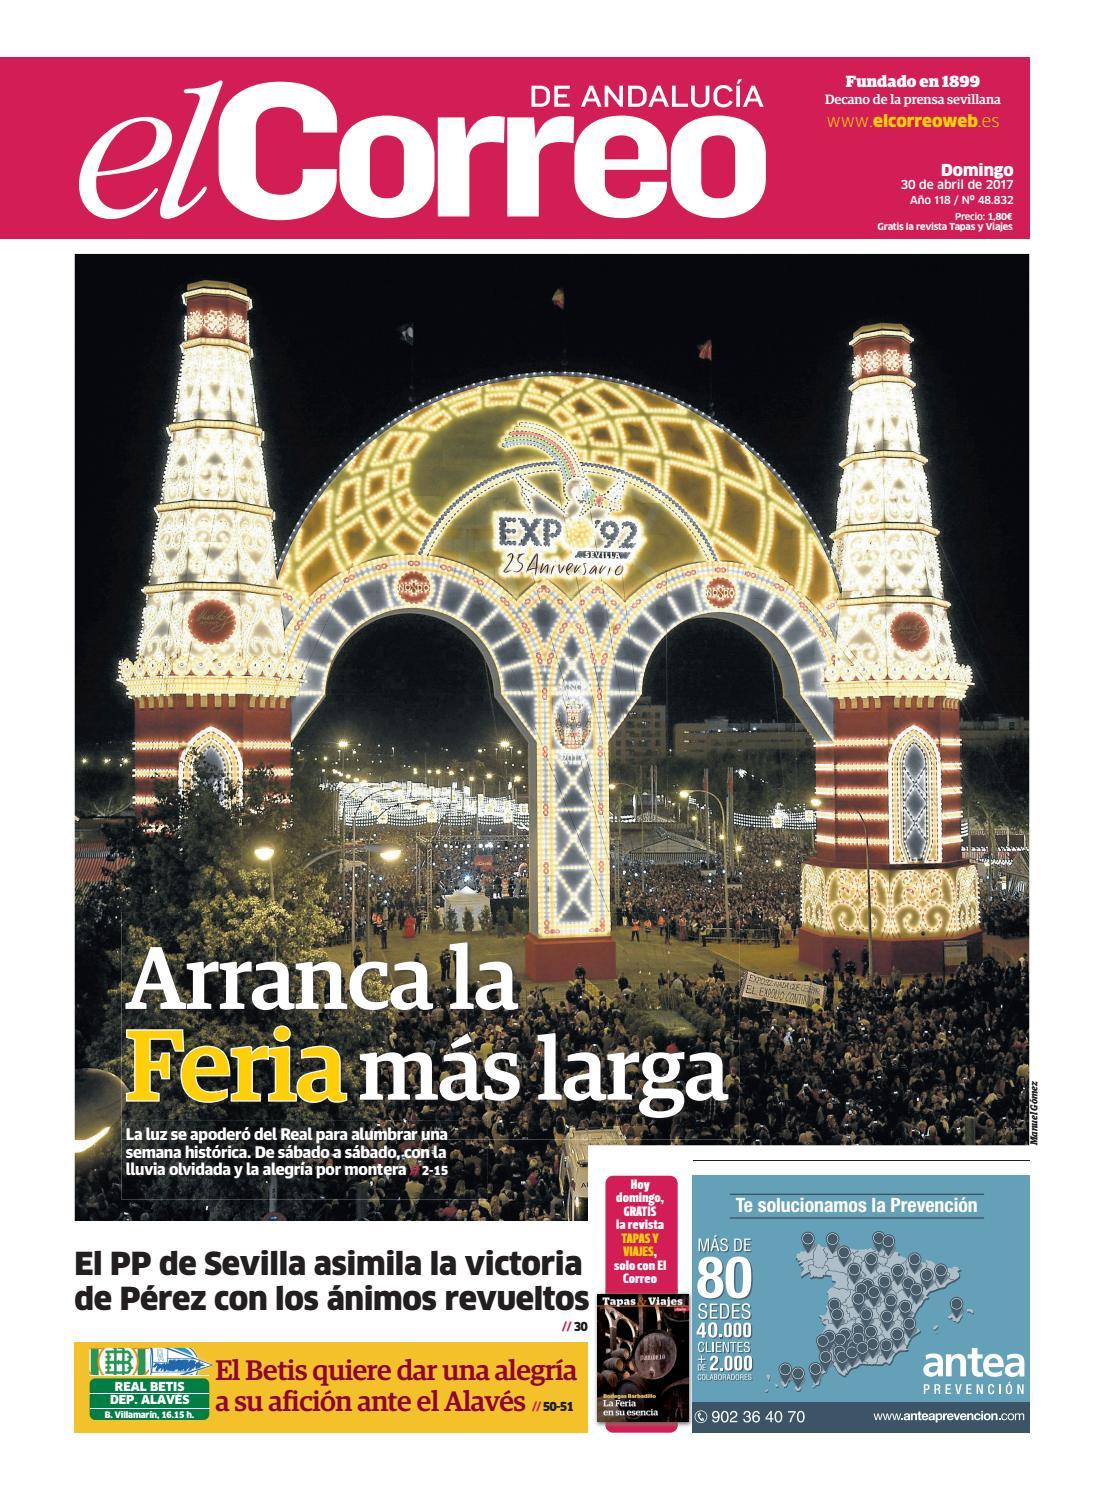 30 04 2017 El Correo De Andaluc A By El Correo De Andaluc A S L  # Muebles Cazo Estepona